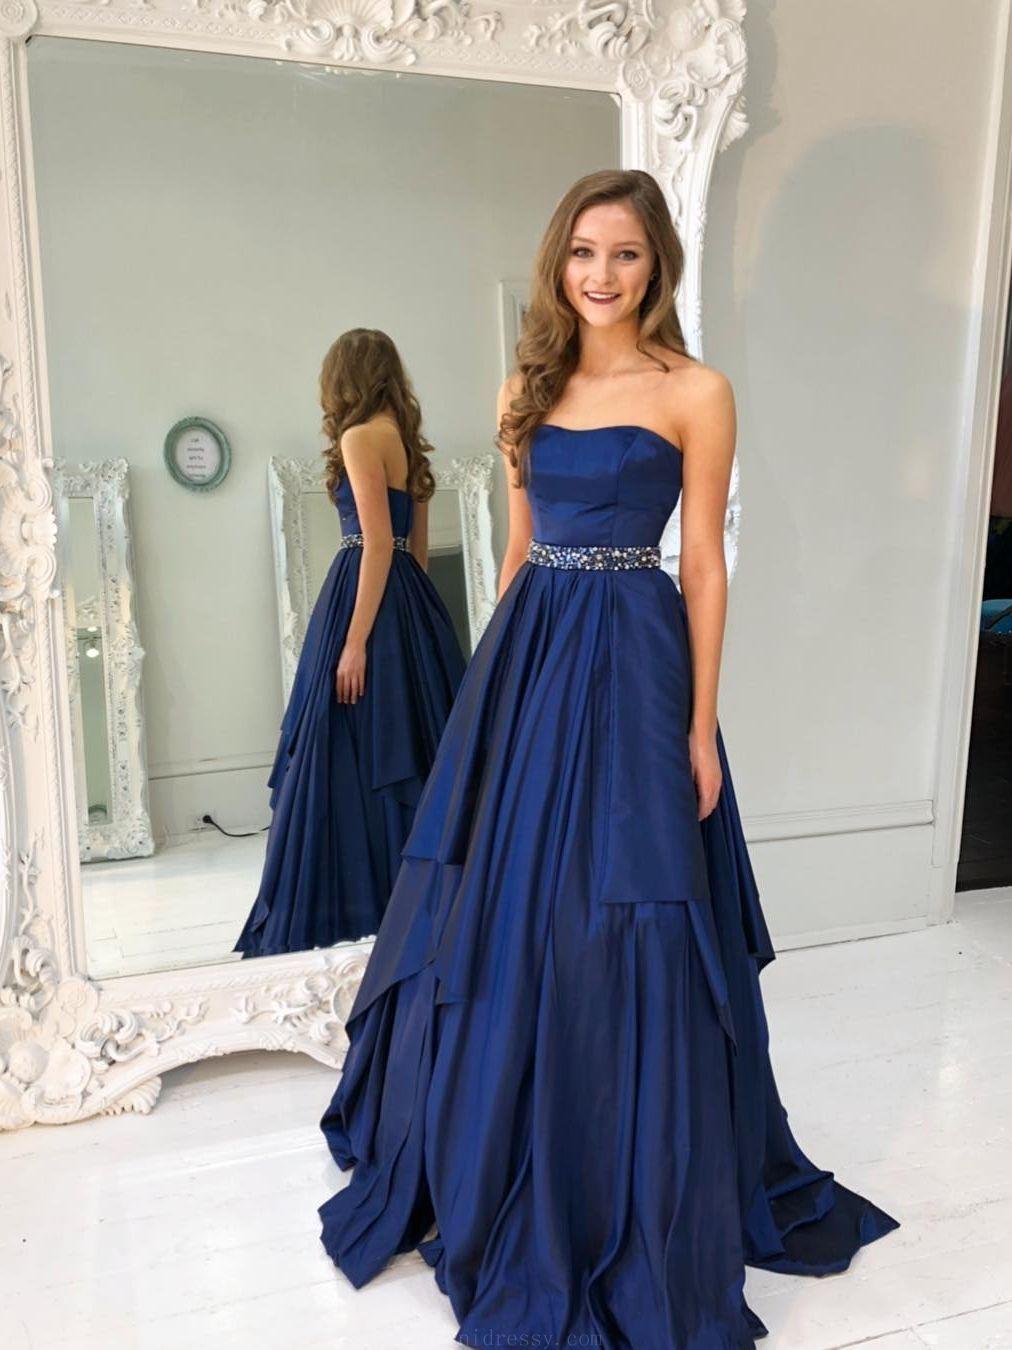 Custom Made Prom Dresses  CustomMadePromDresses c058a965ddb8